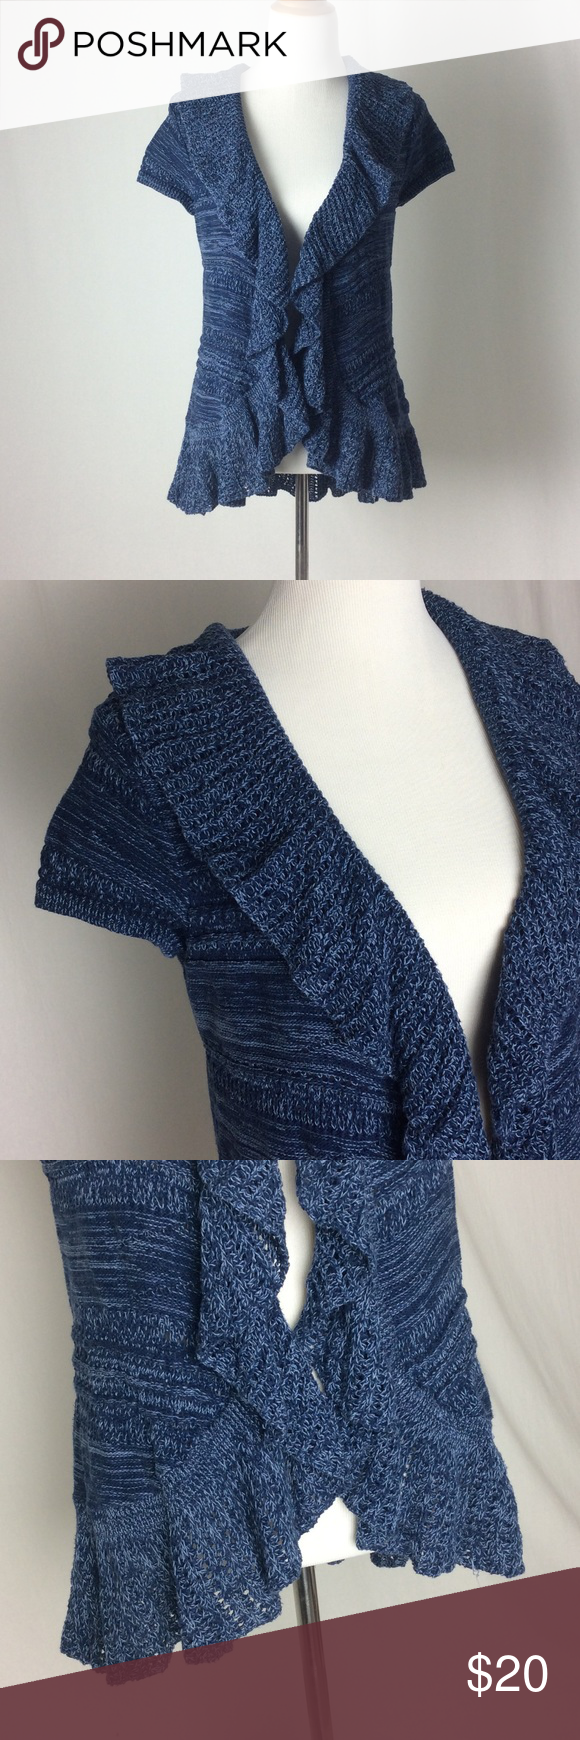 Style & Co. knit shrug | Knit shrug, Shrug cardigan and Summer parties